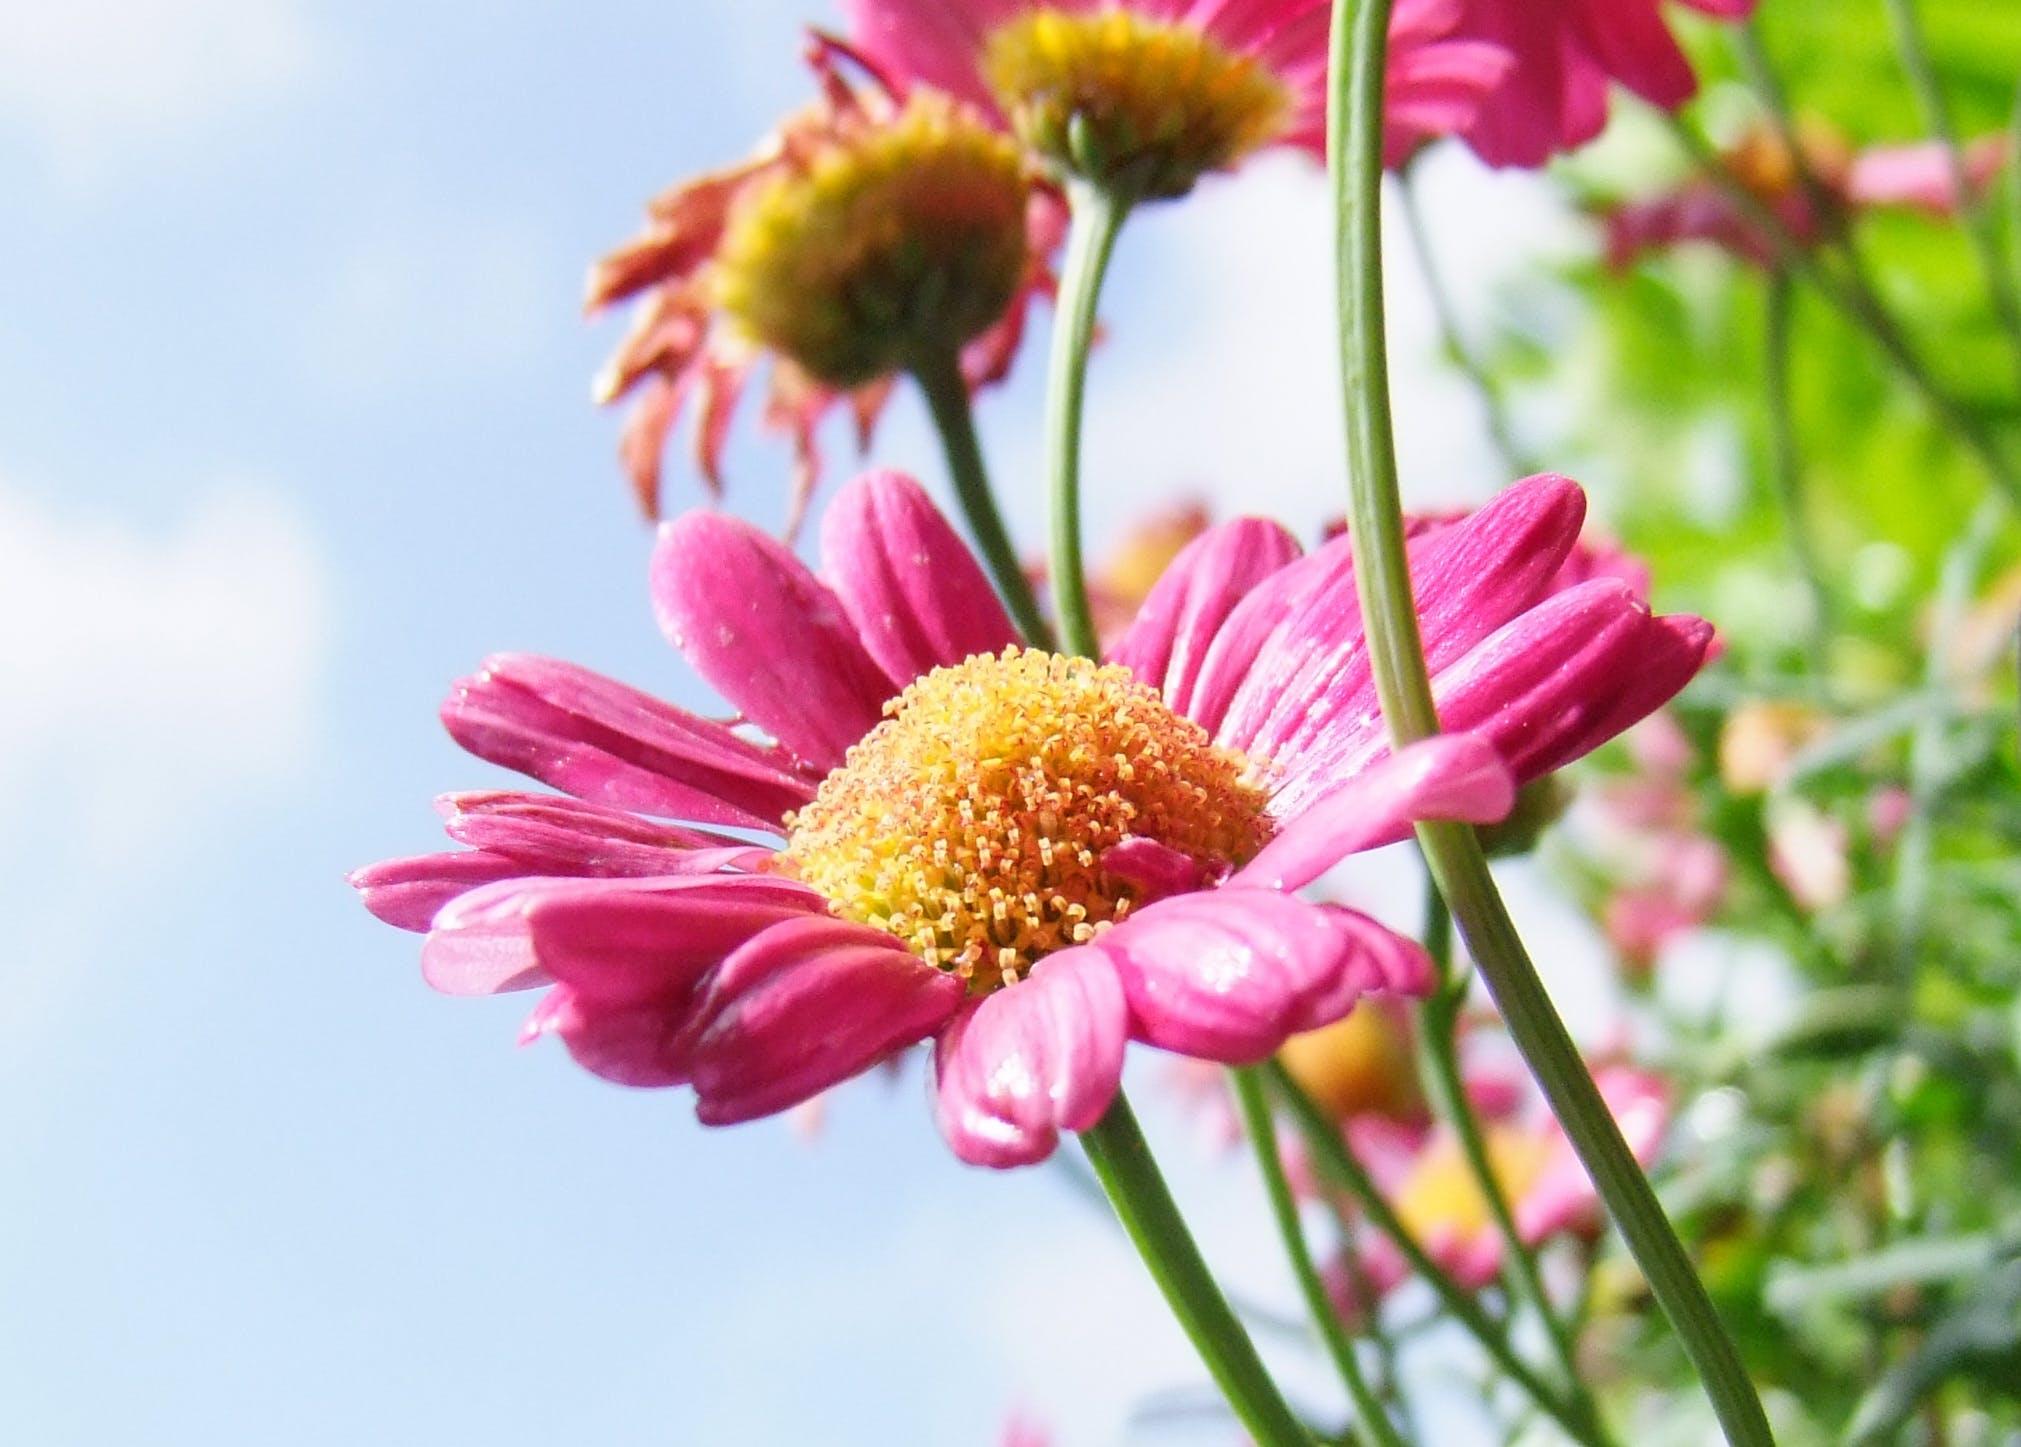 Kostenloses Stock Foto zu blühen, blumen, blüte, blütenblatt